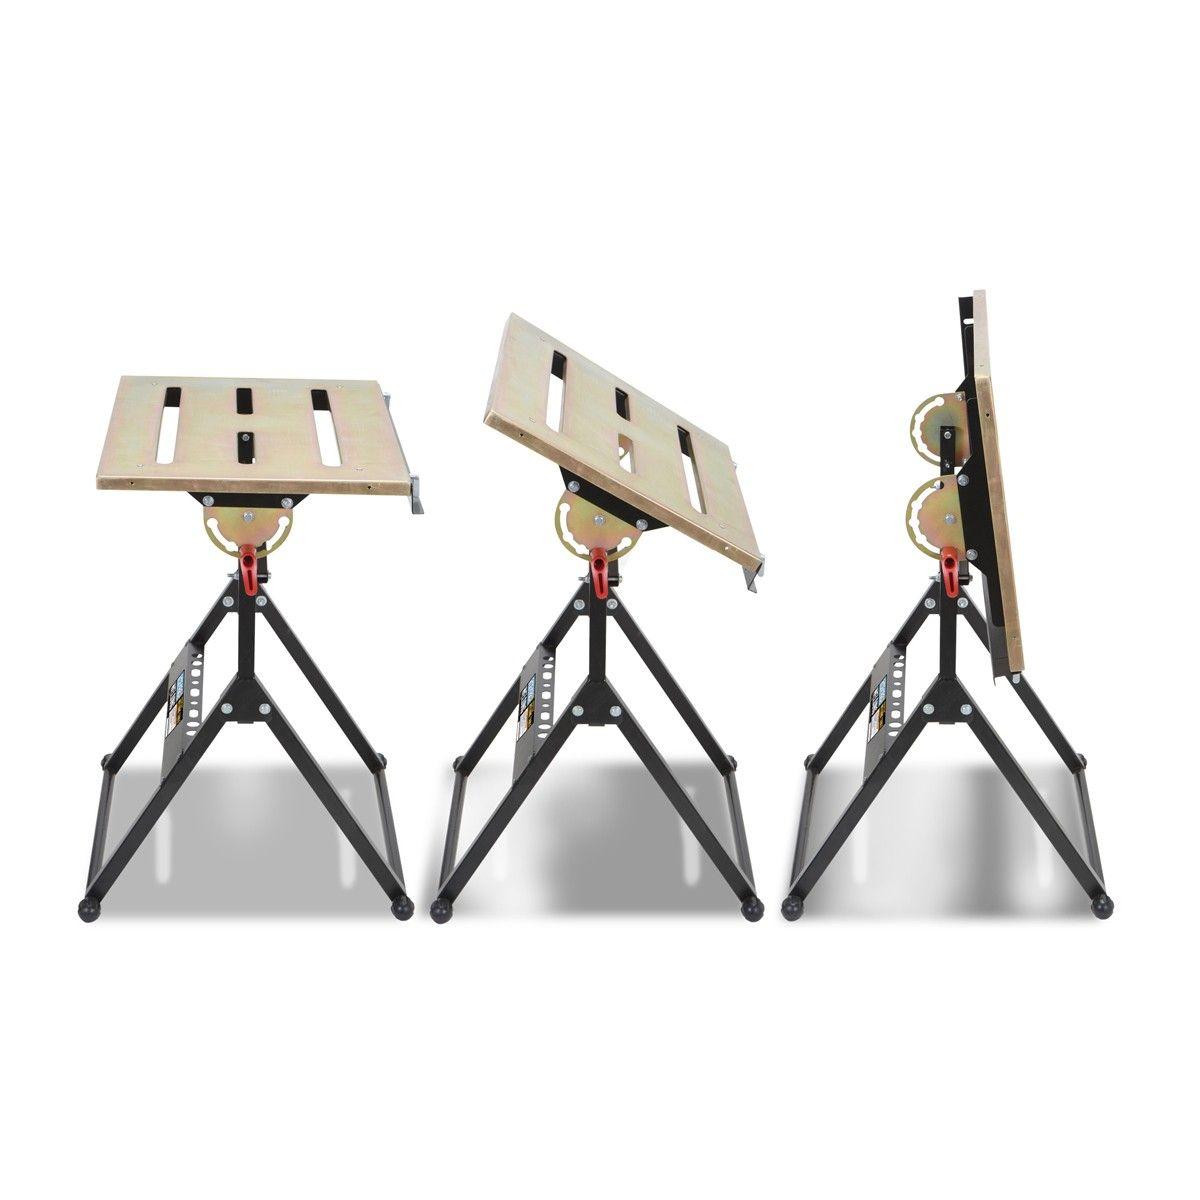 Adjustable Steel Welding Table Welding table and Steel